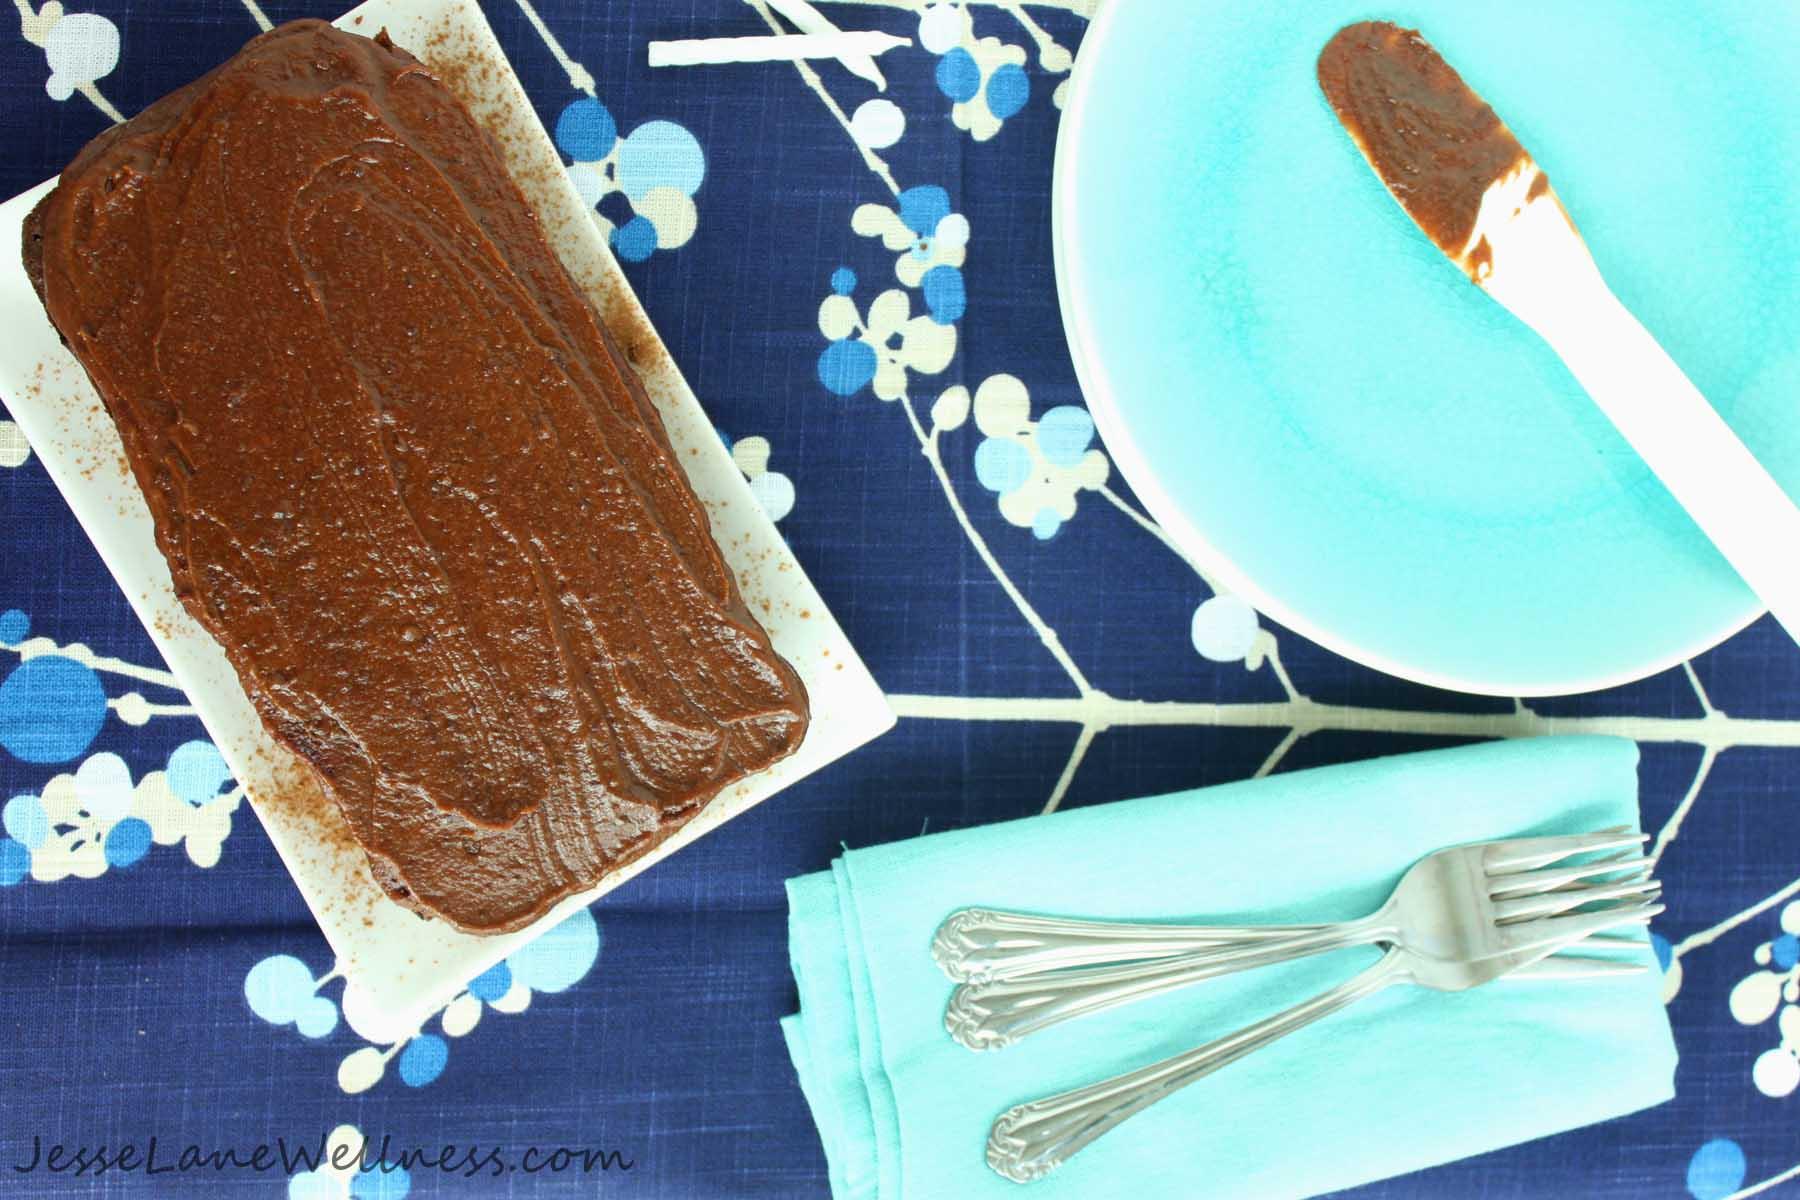 Carob Cake with Fudge Icing by @JesseLWellness #carobcake